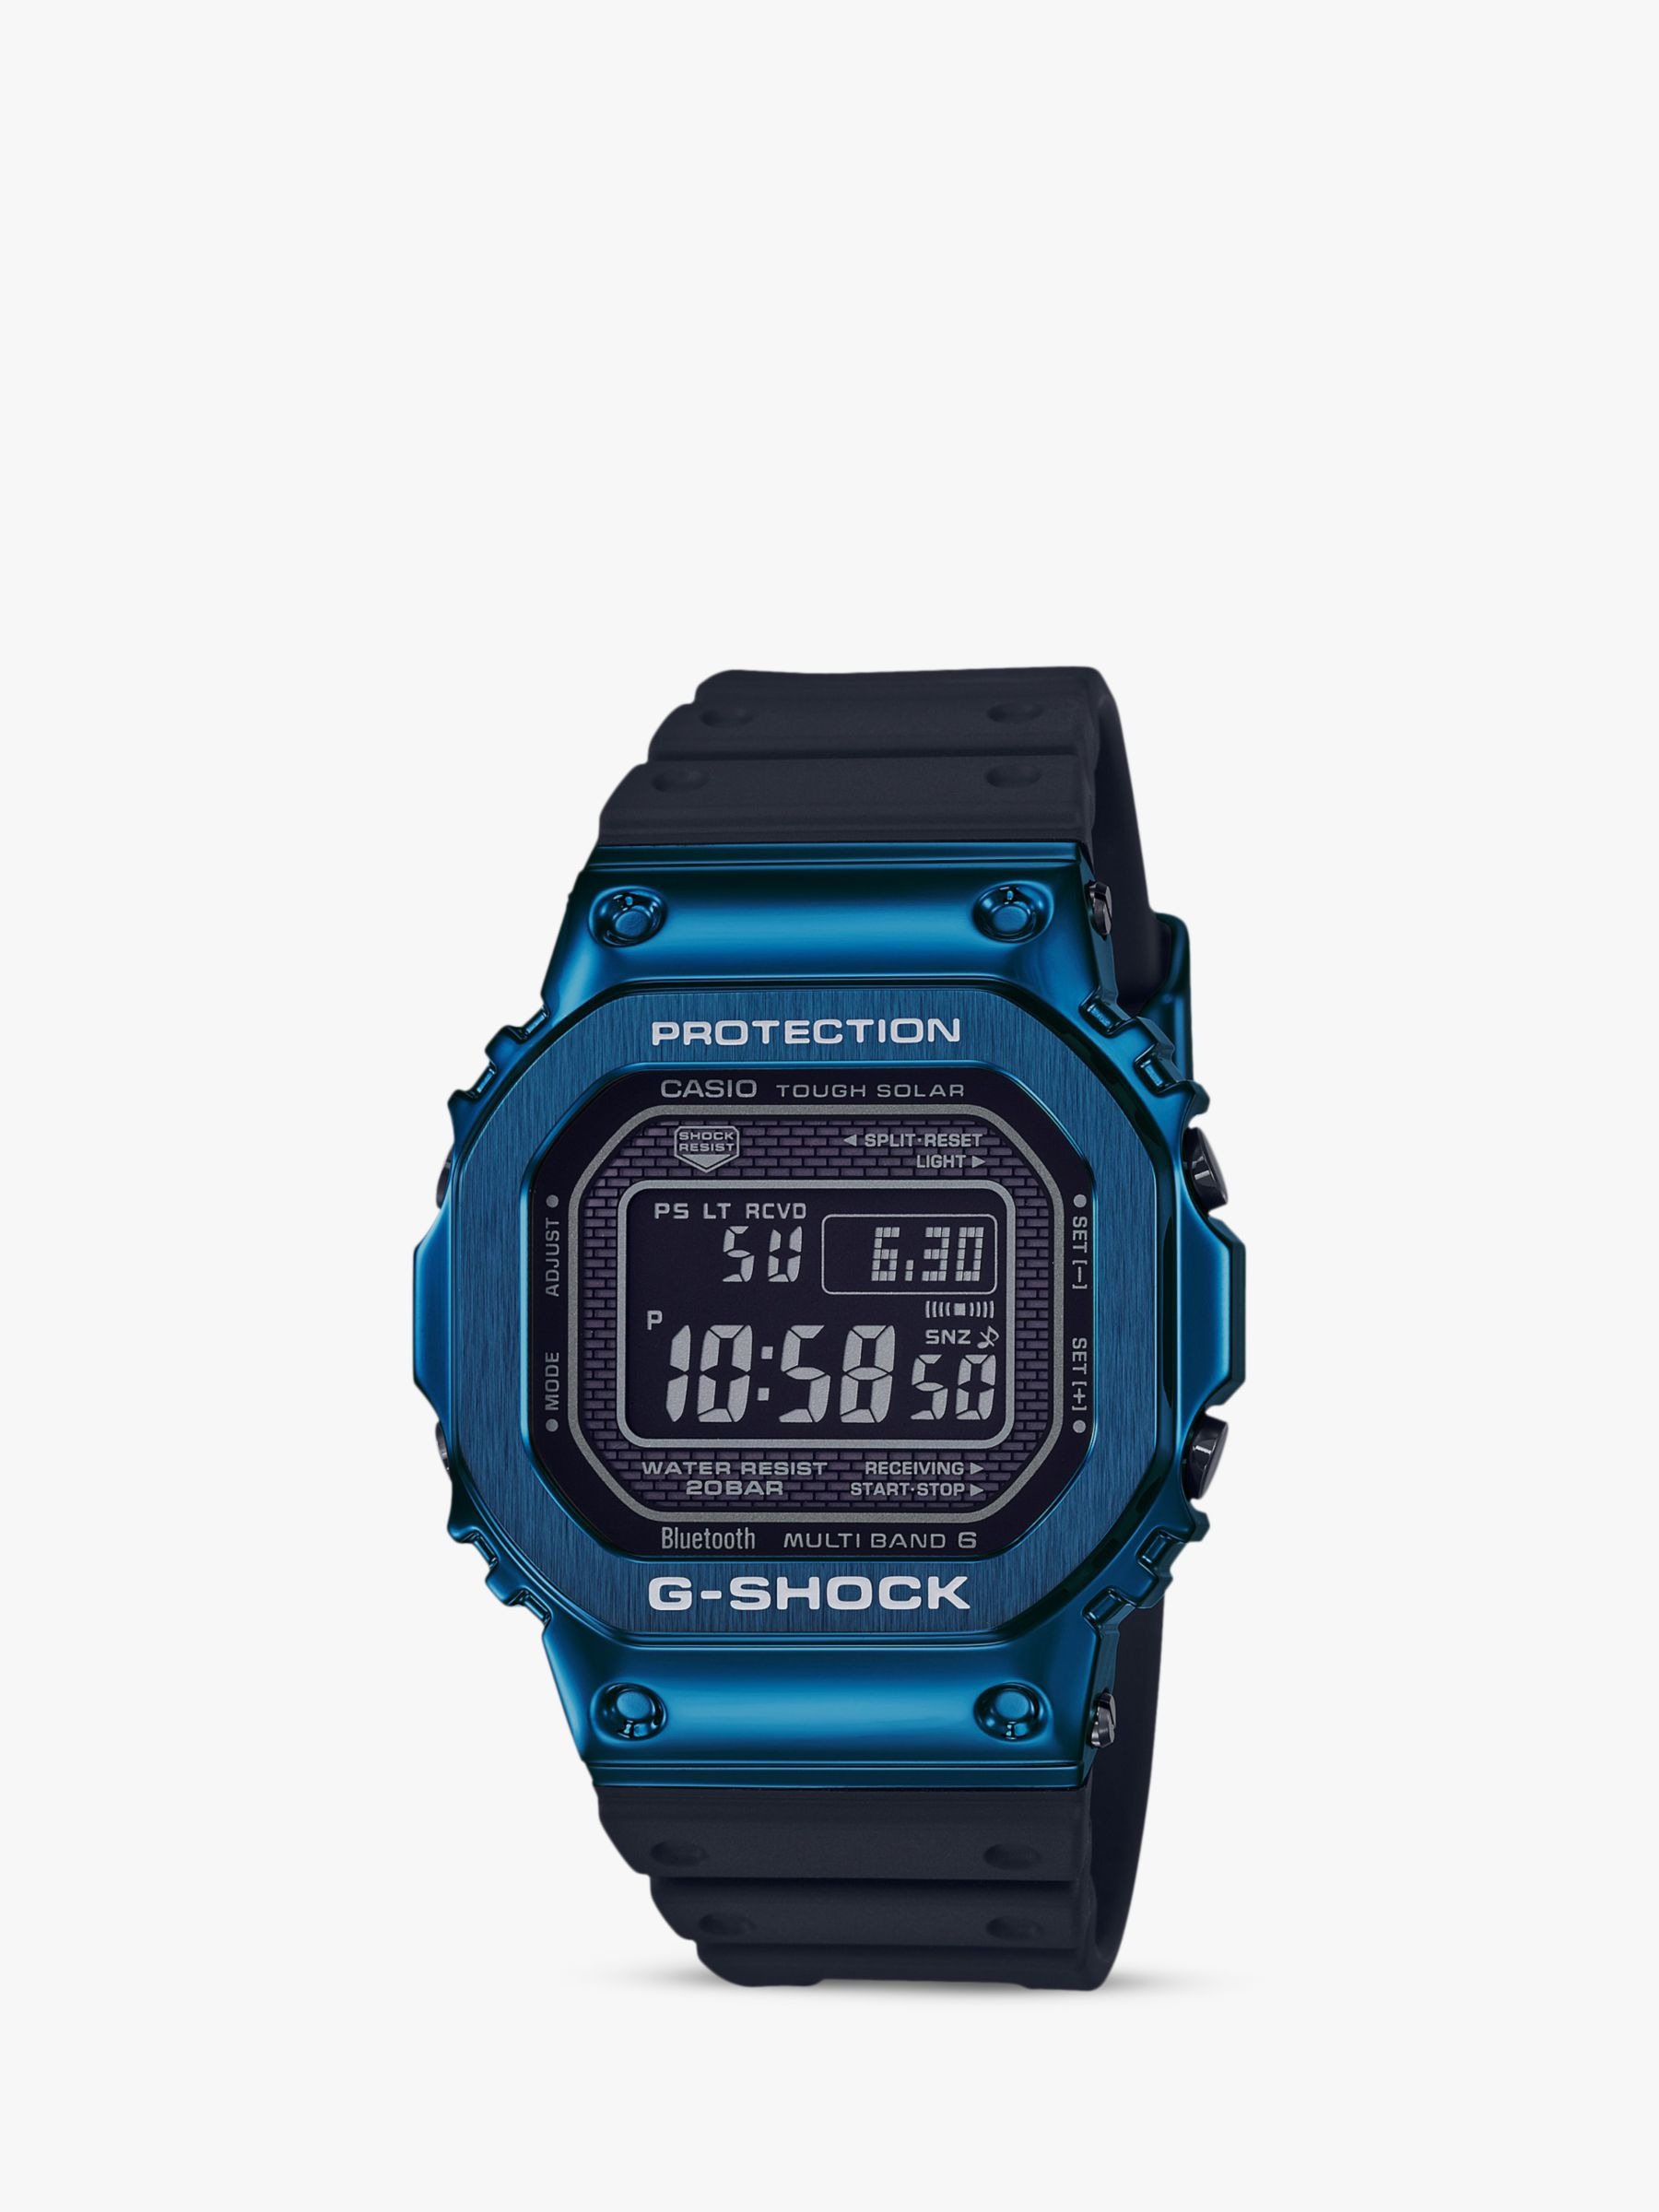 Casio Casio Men's G-Shock GMW-B5000G-2ER Digital Resin Strap Watch, Black/Blue